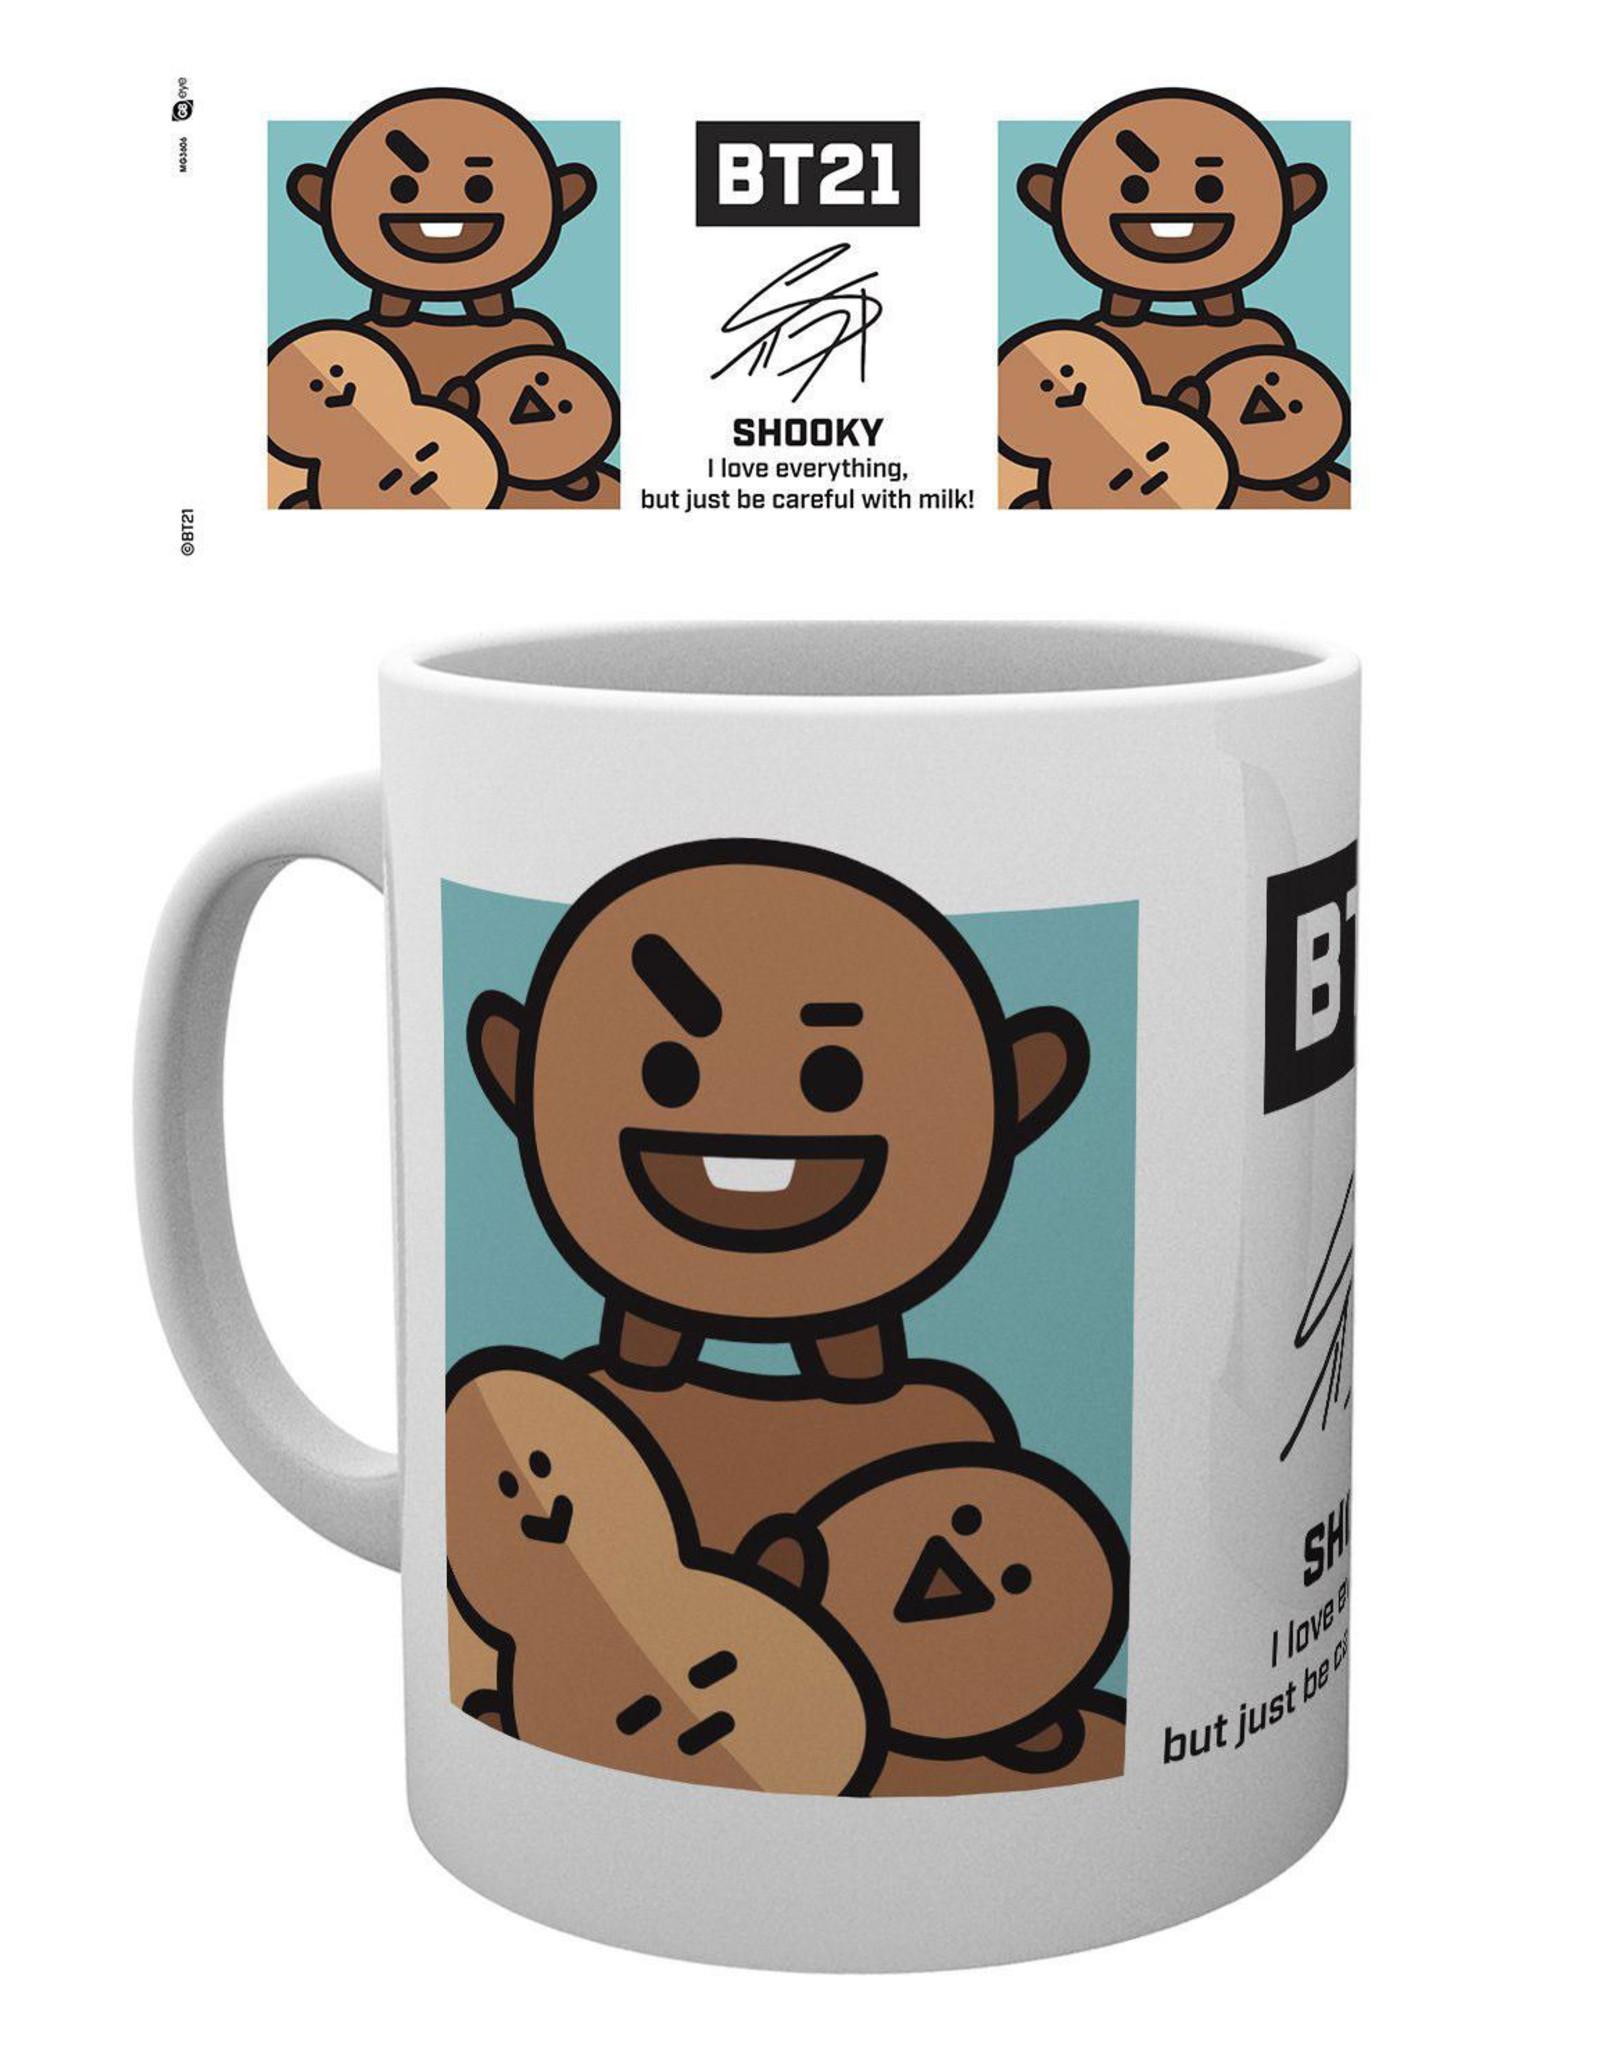 BT21 - Shooky - Mug